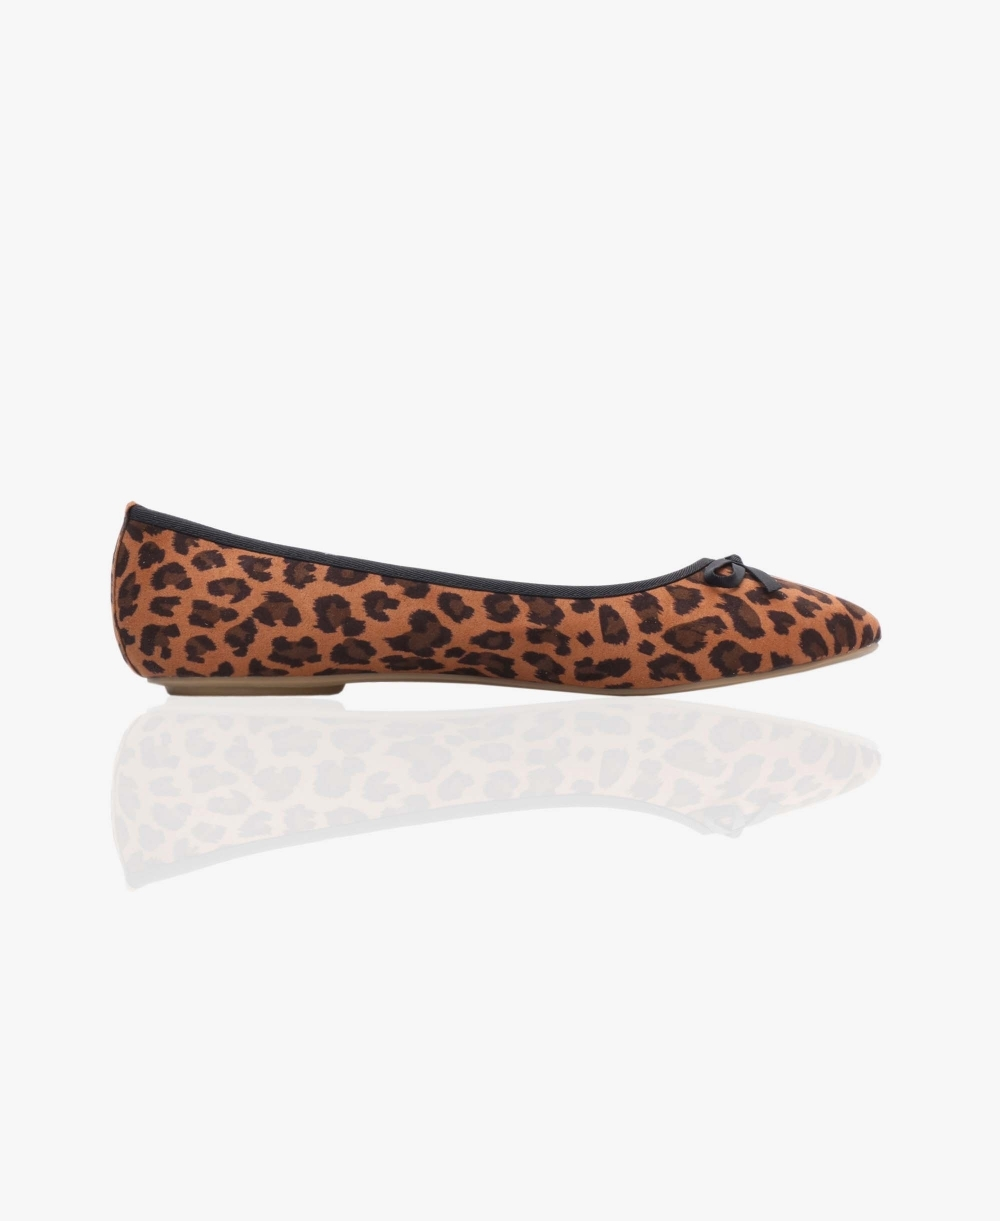 fd905b25dd6 Ballerinas | Faux Suede Leopard Ballerina Pumps | KRISP